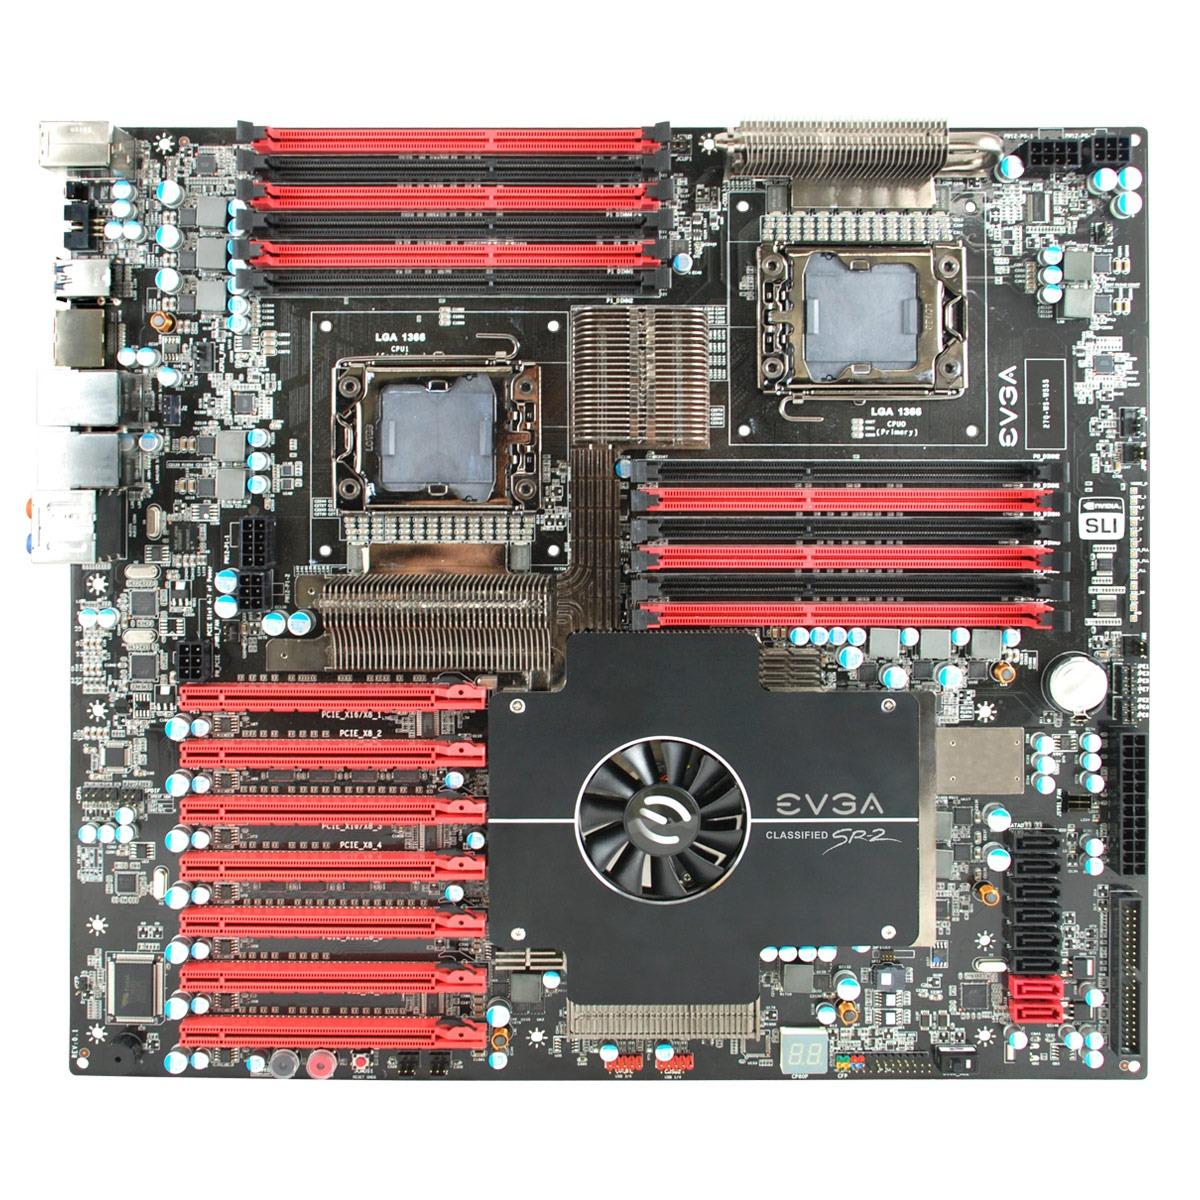 Carte mère EVGA Classified SR-2 (Intel 5520) - HPTX EVGA Classified SR-2 (Intel 5520) - HPTX